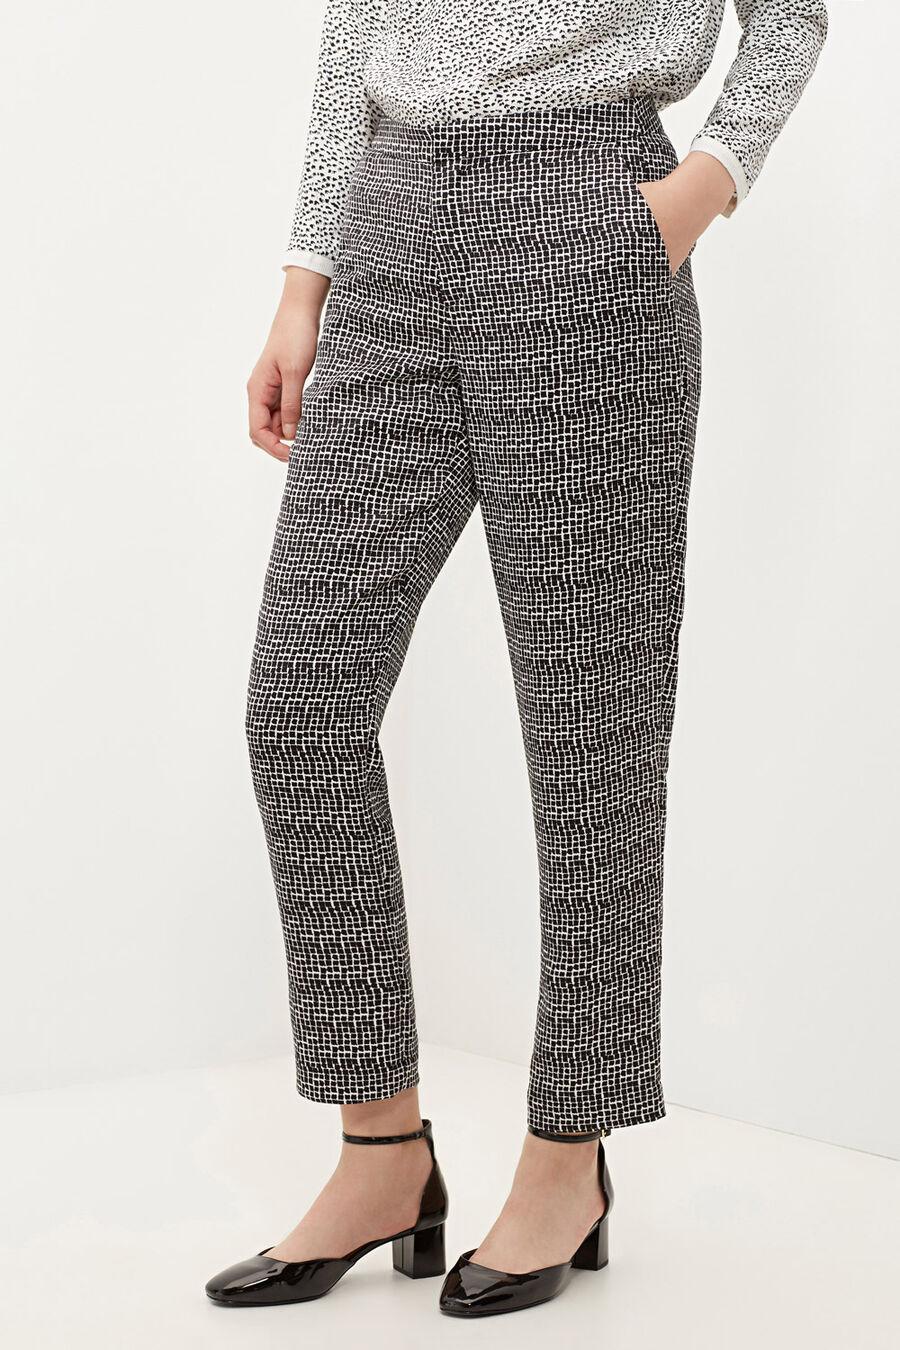 Peg leg trousers